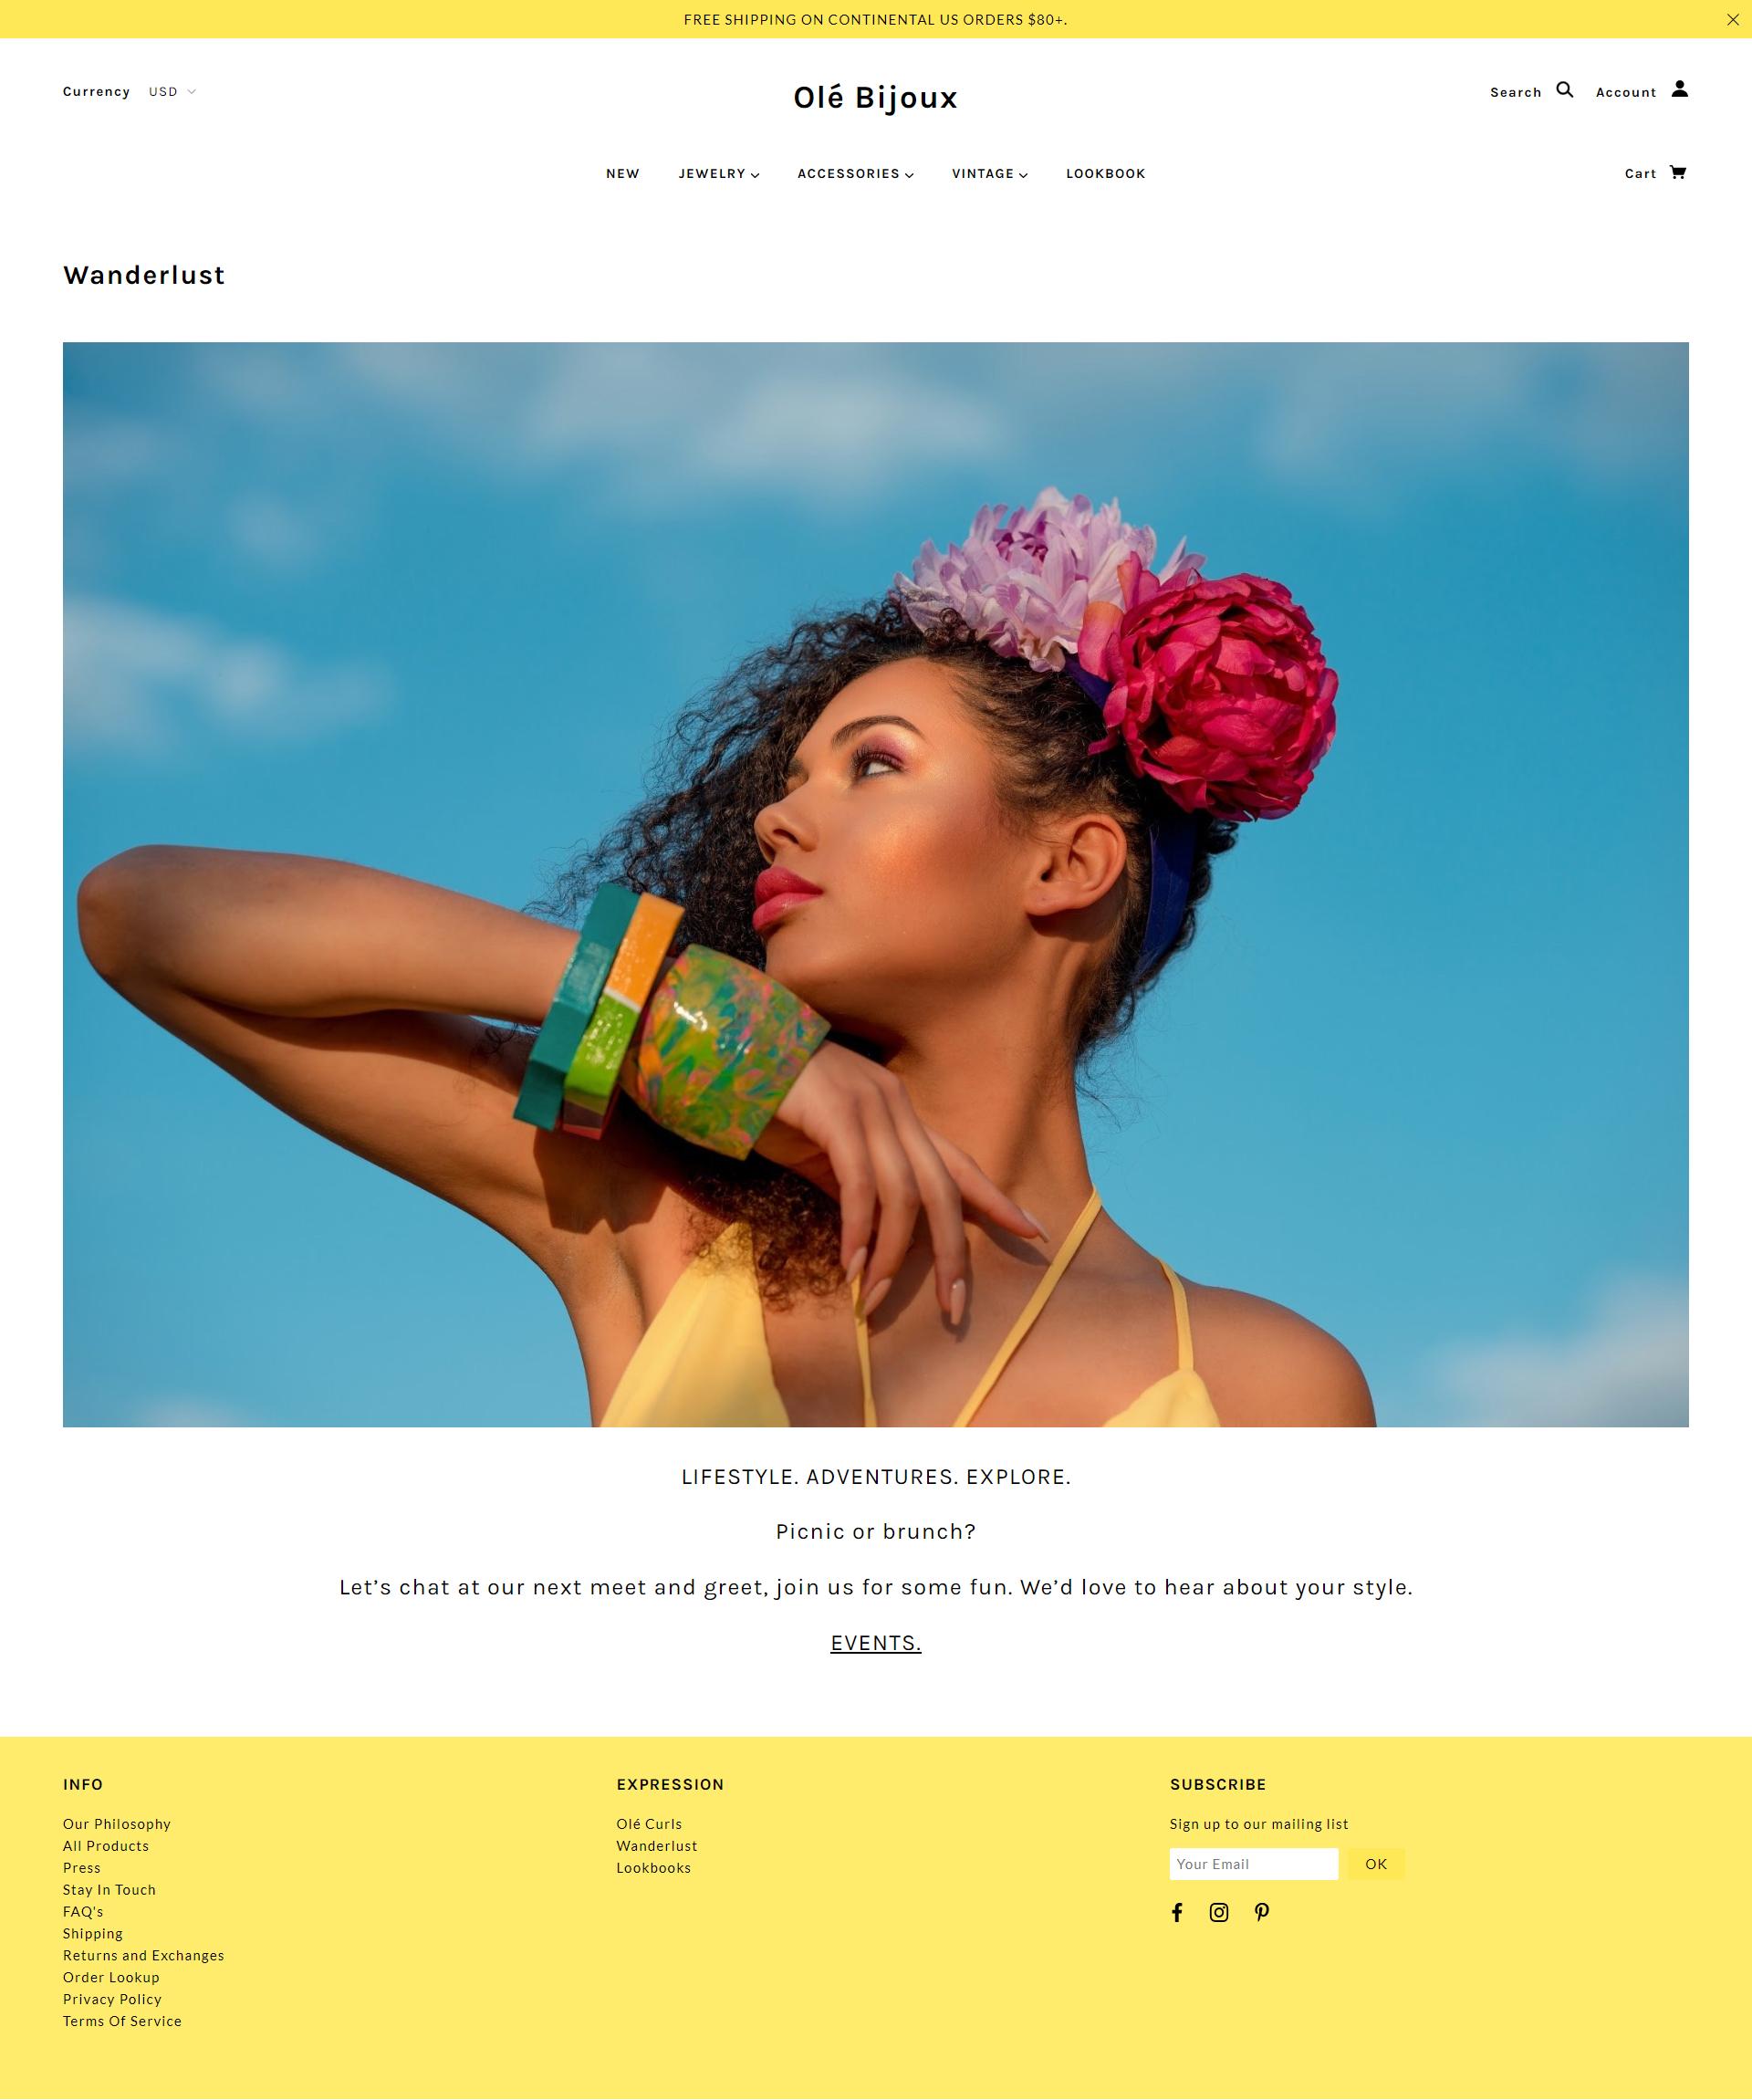 screencapture-ole-bijoux-myshopify-pages-wanderlust-2019-02-06-18_28_23.png